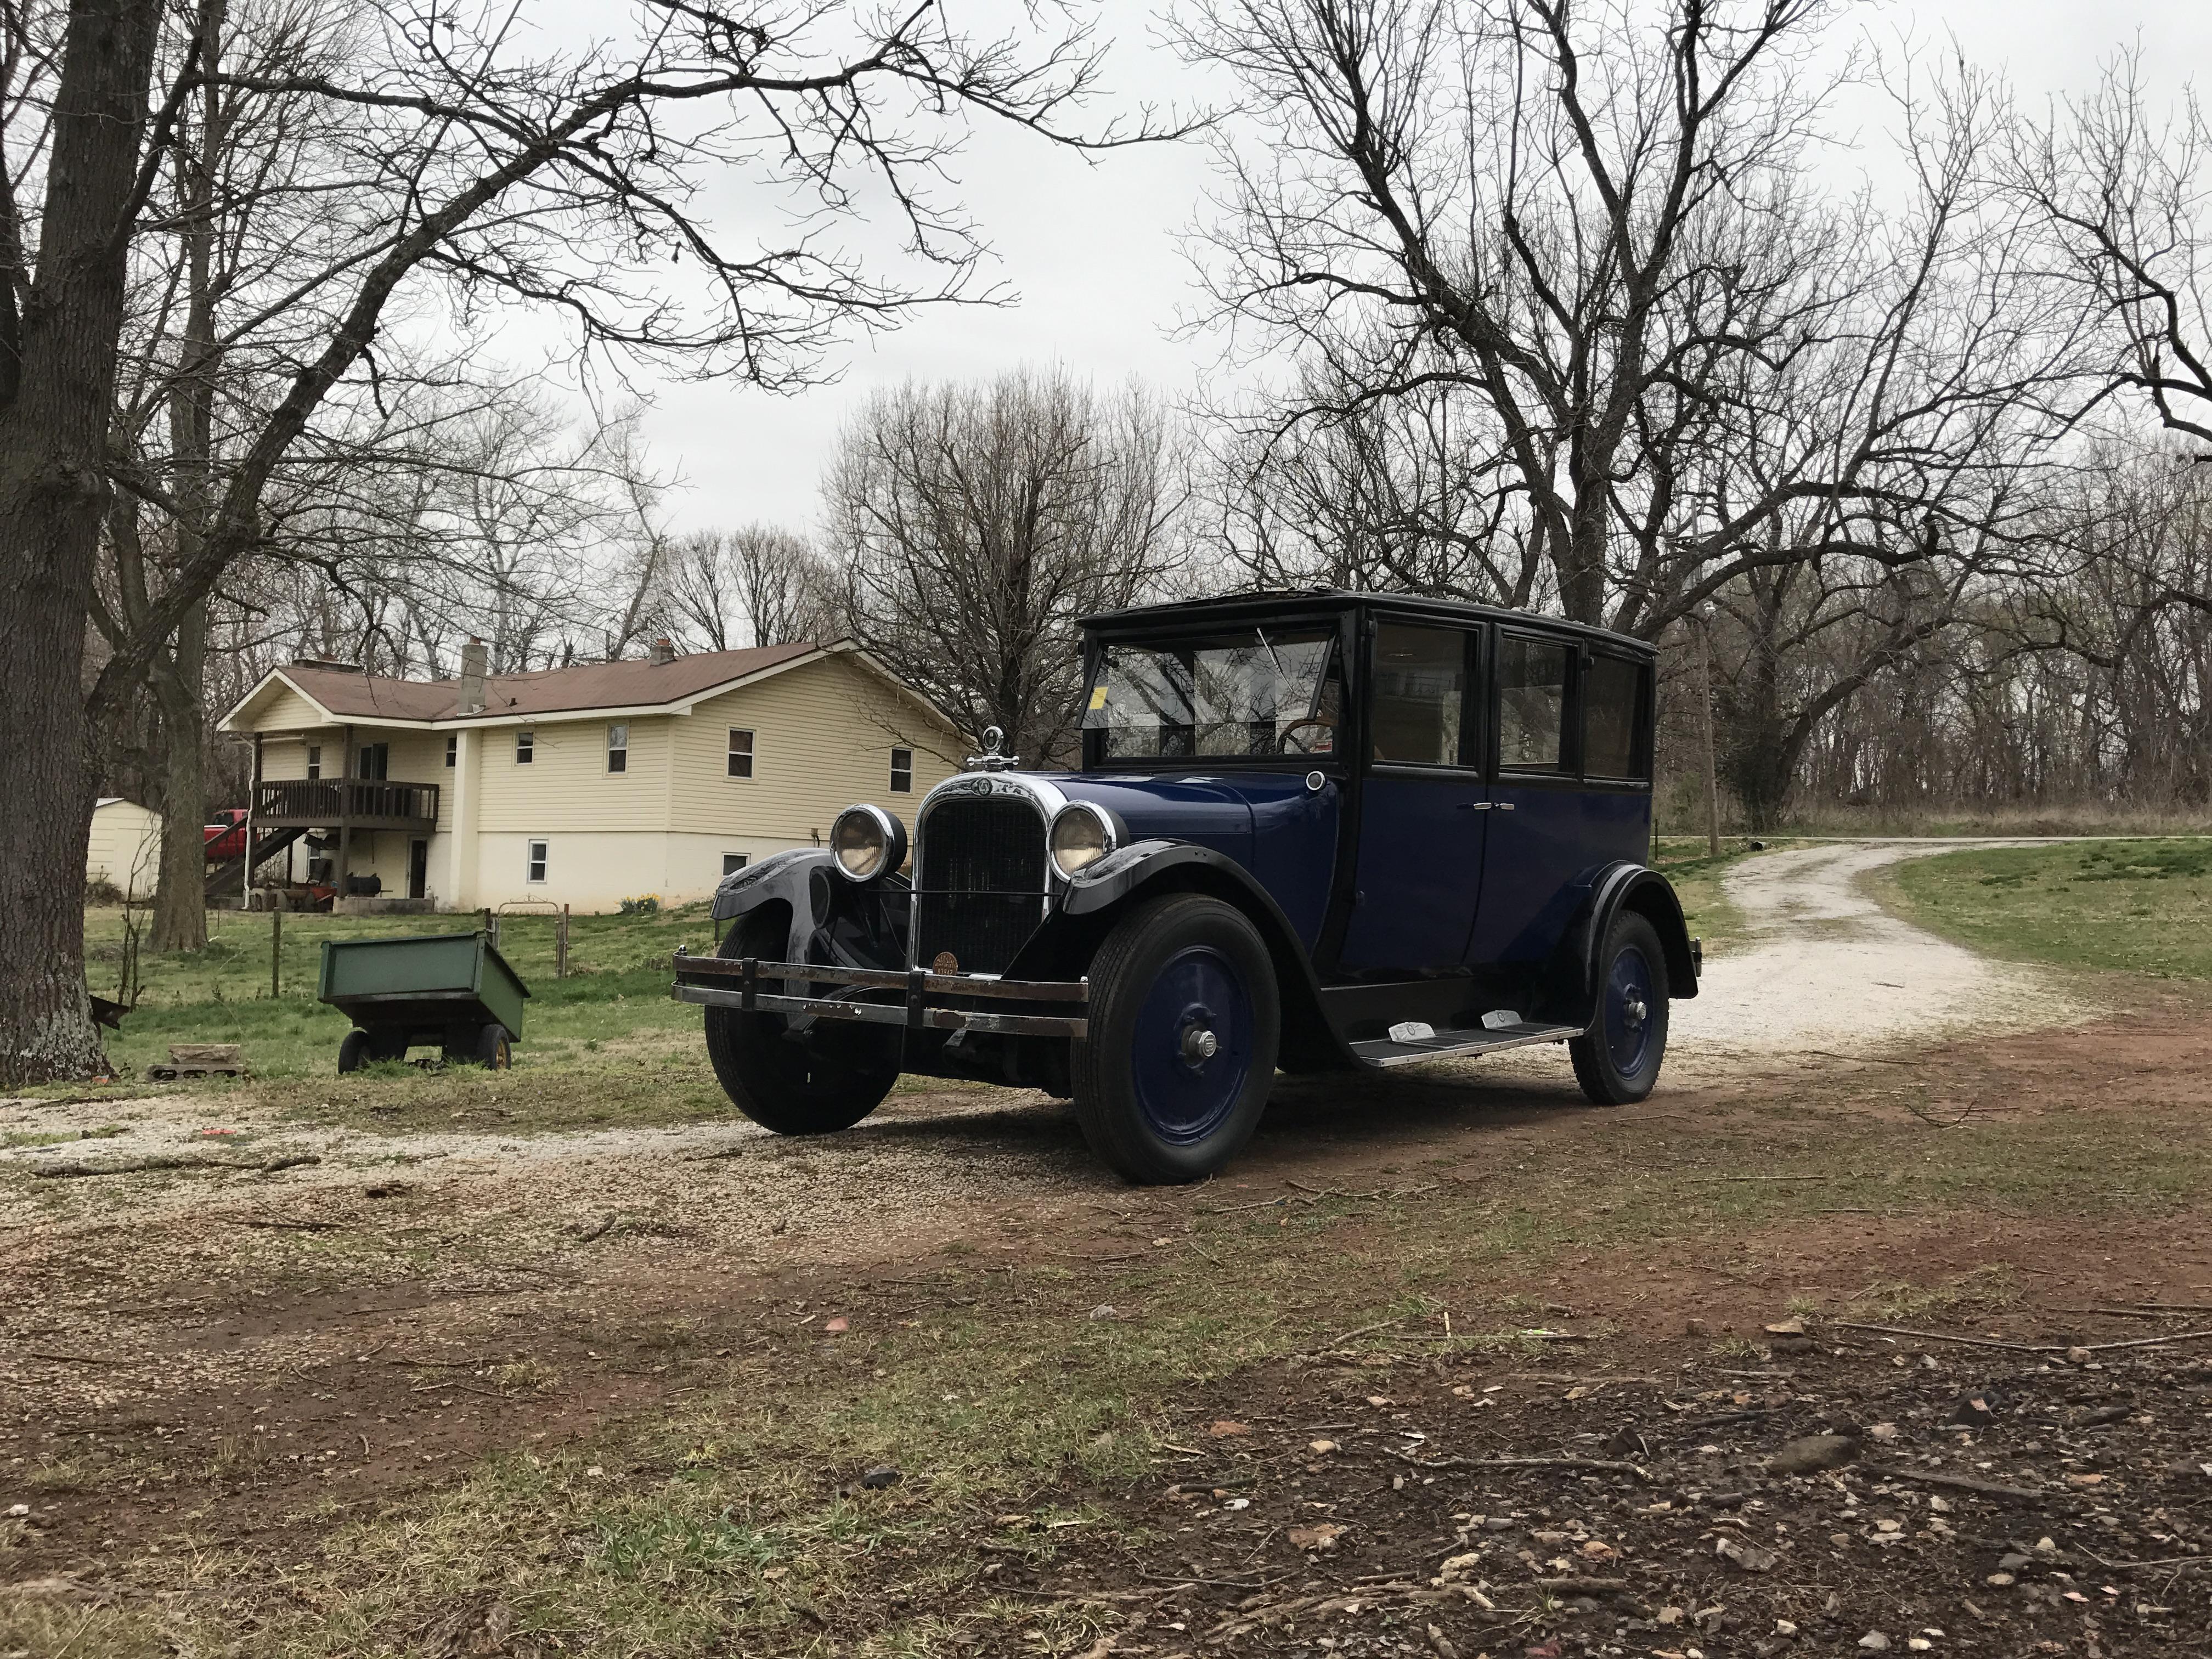 1925 dodge brothers sedan FS - Cars For Sale - Antique Automobile ...